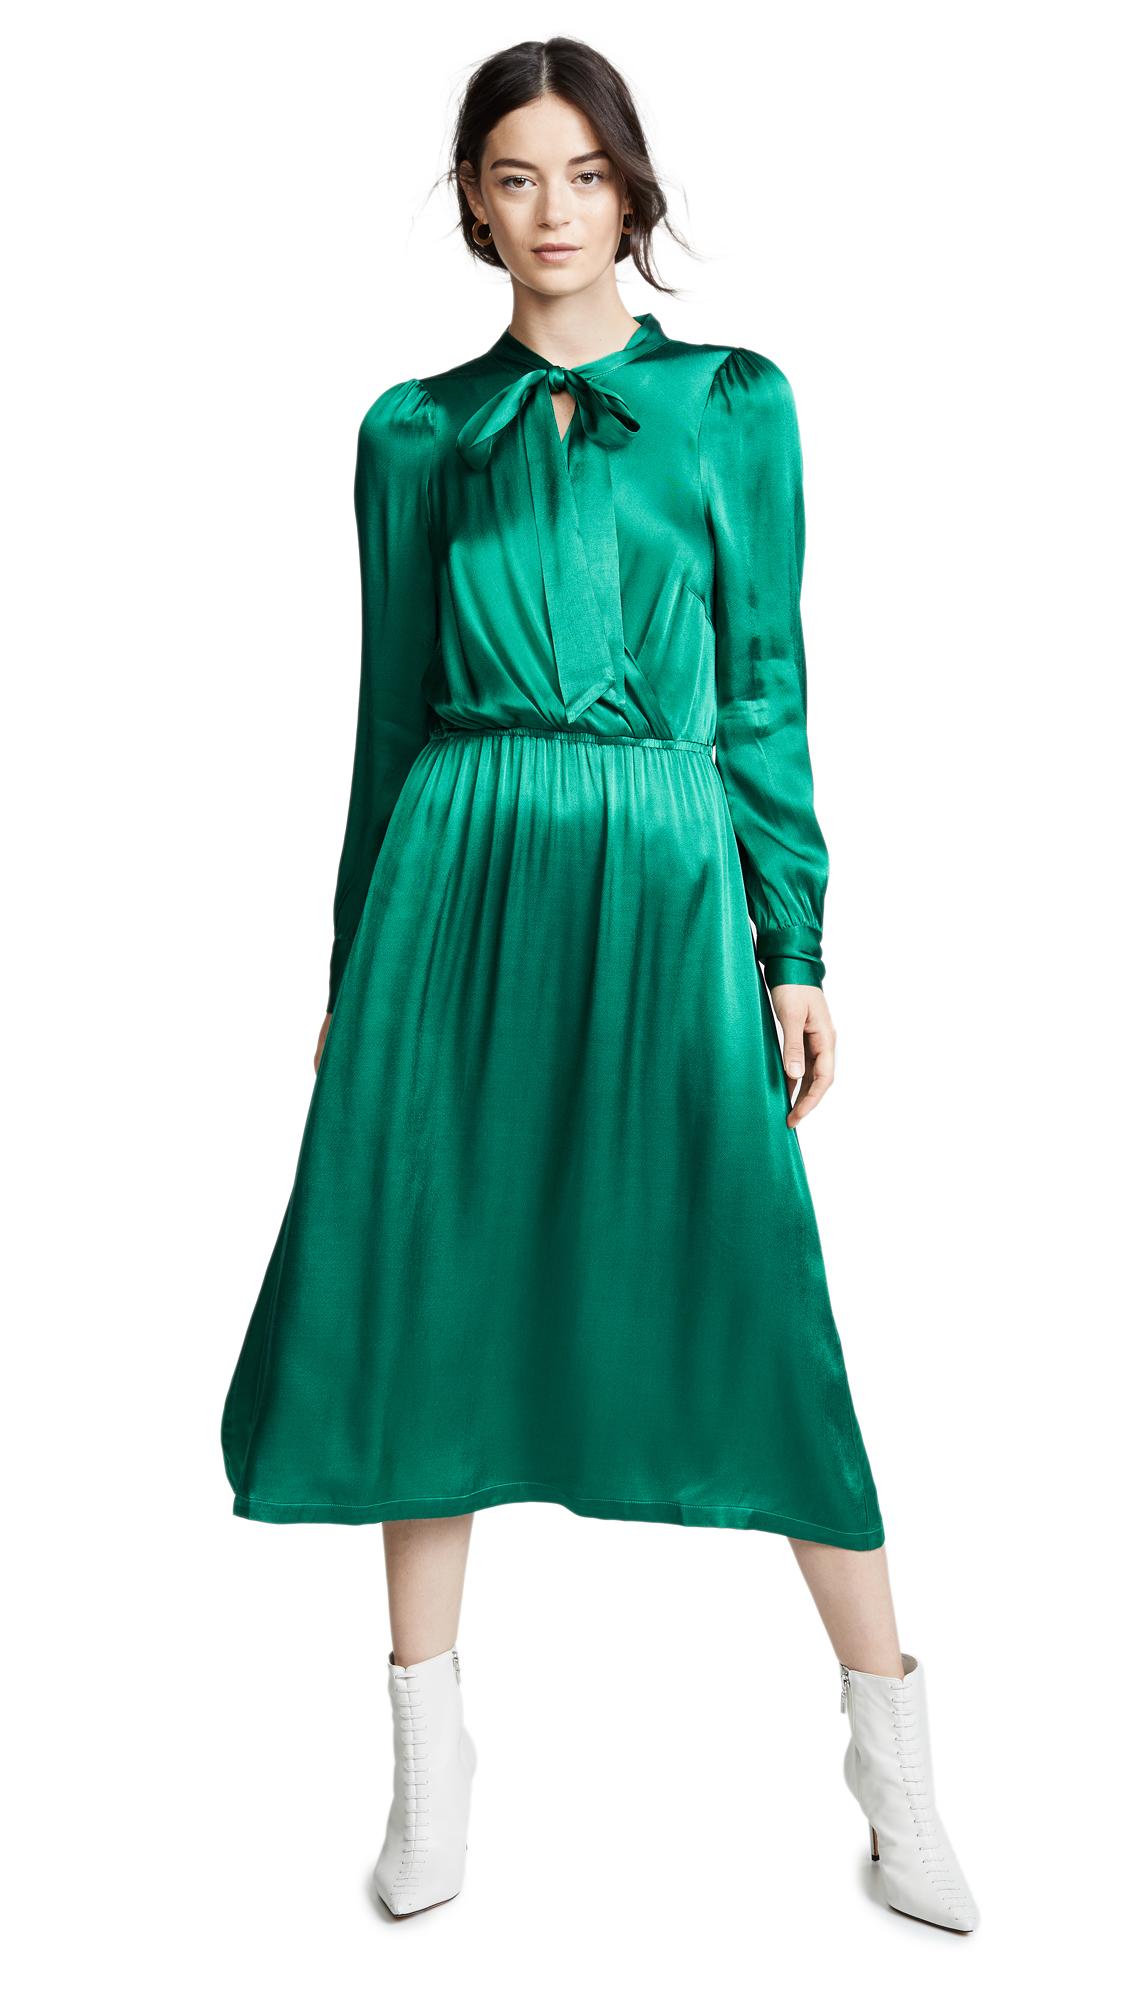 Suncoo Cosette Dress In Green